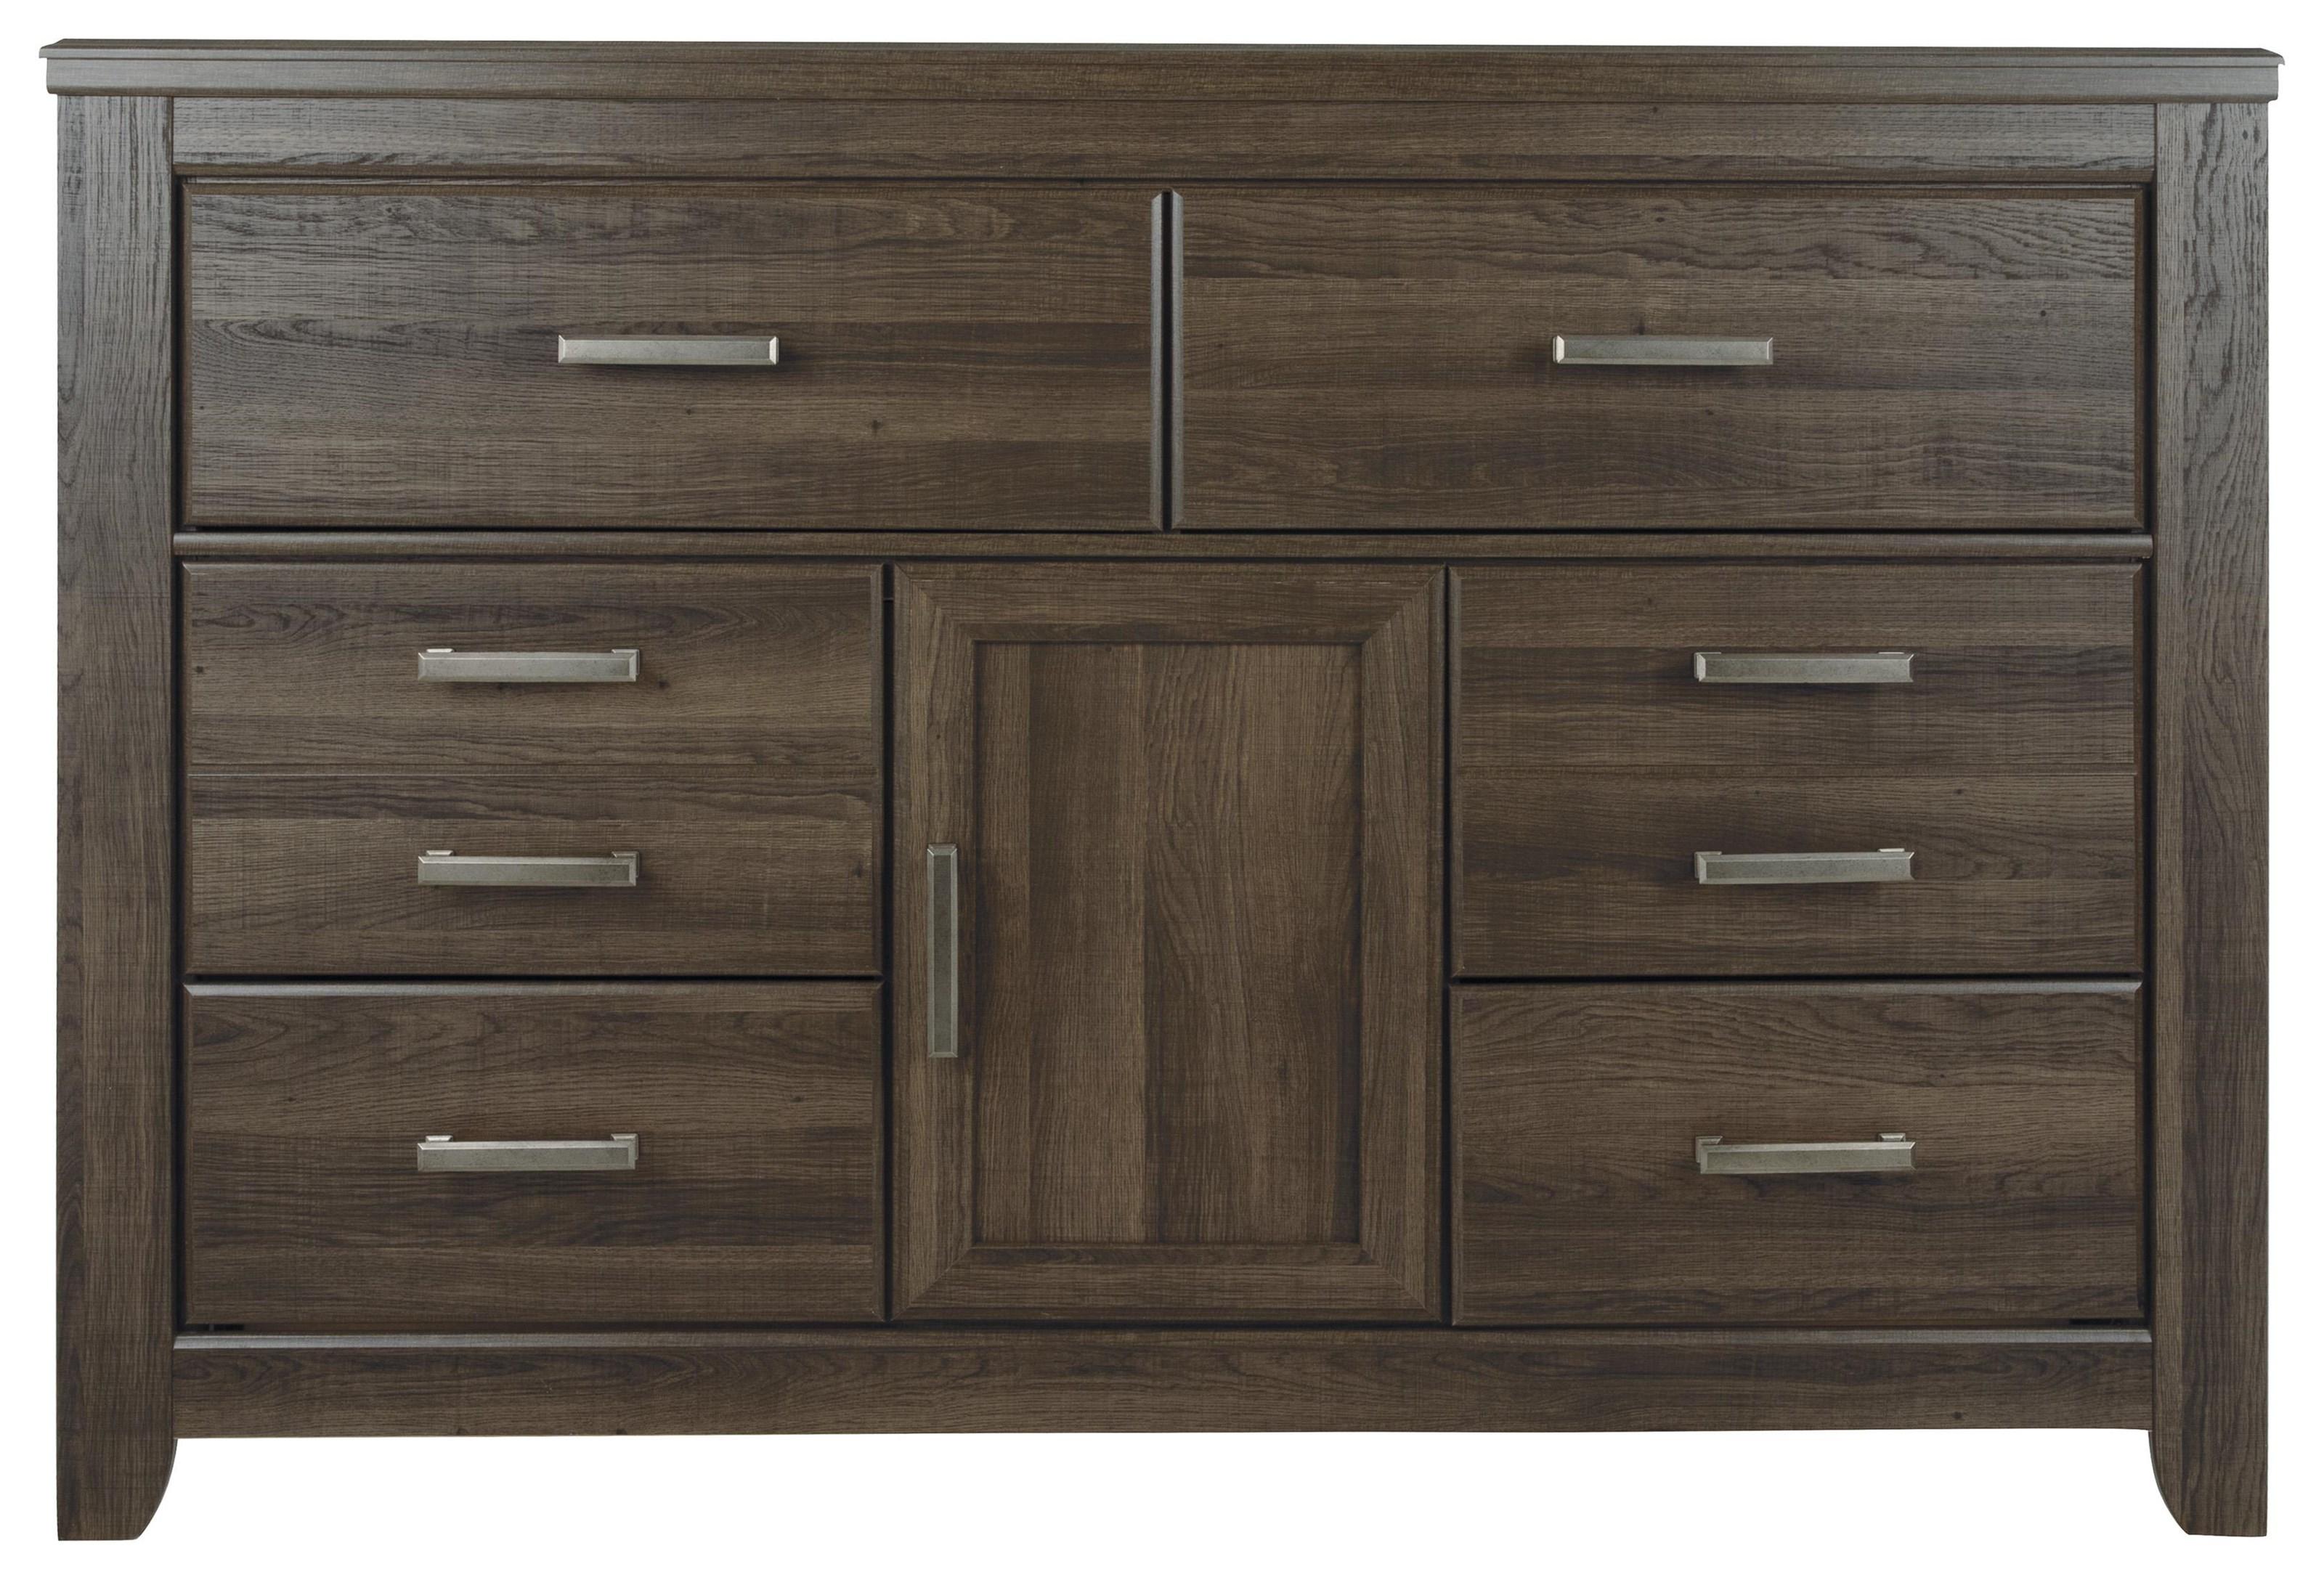 Juararo 6 Drawer Dresser by Signature Design by Ashley at HomeWorld Furniture